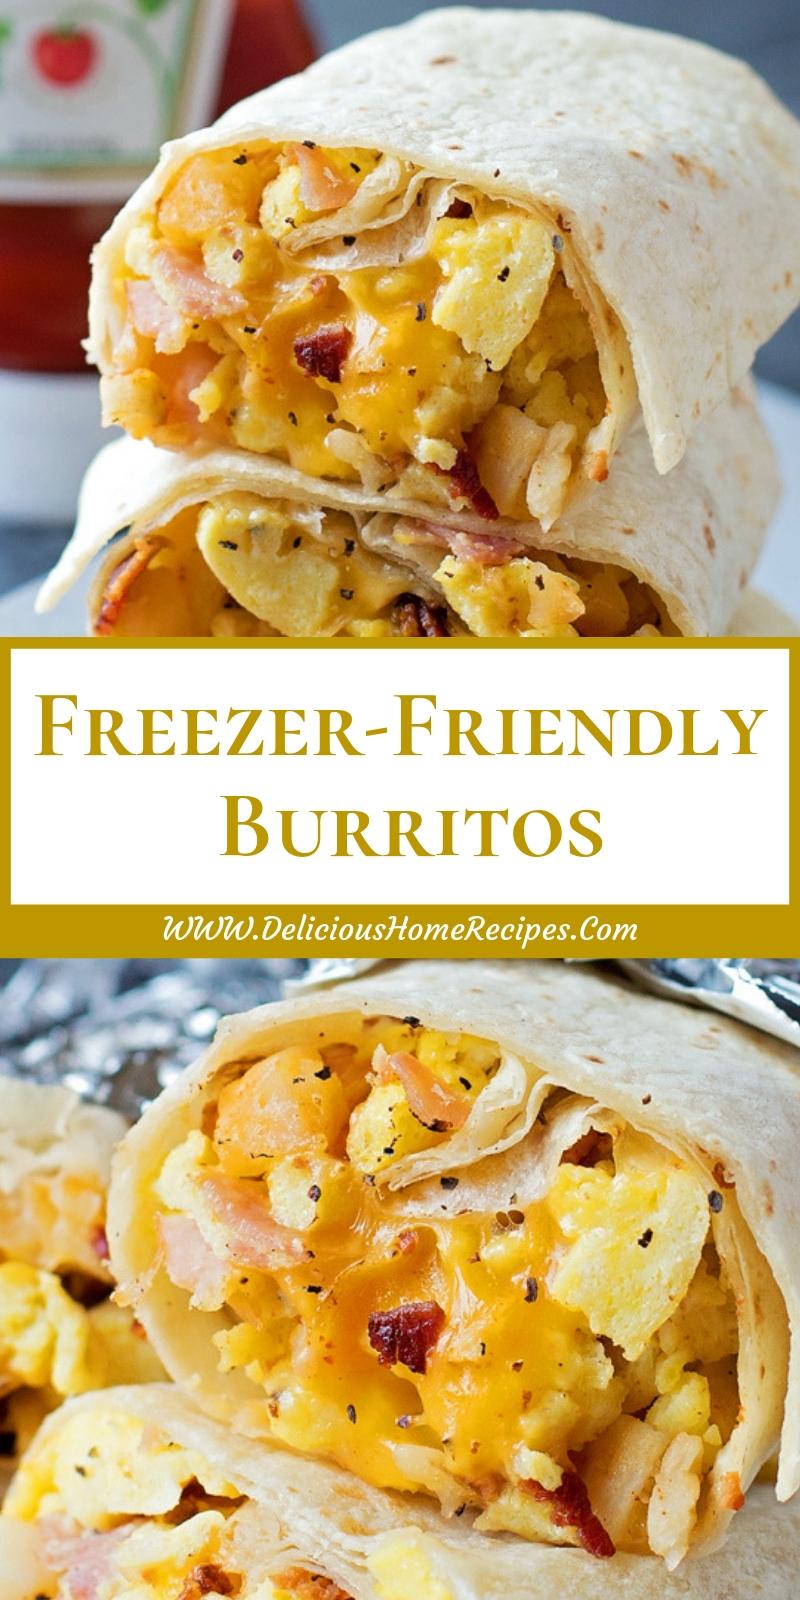 Freezer-Friendly Burritos